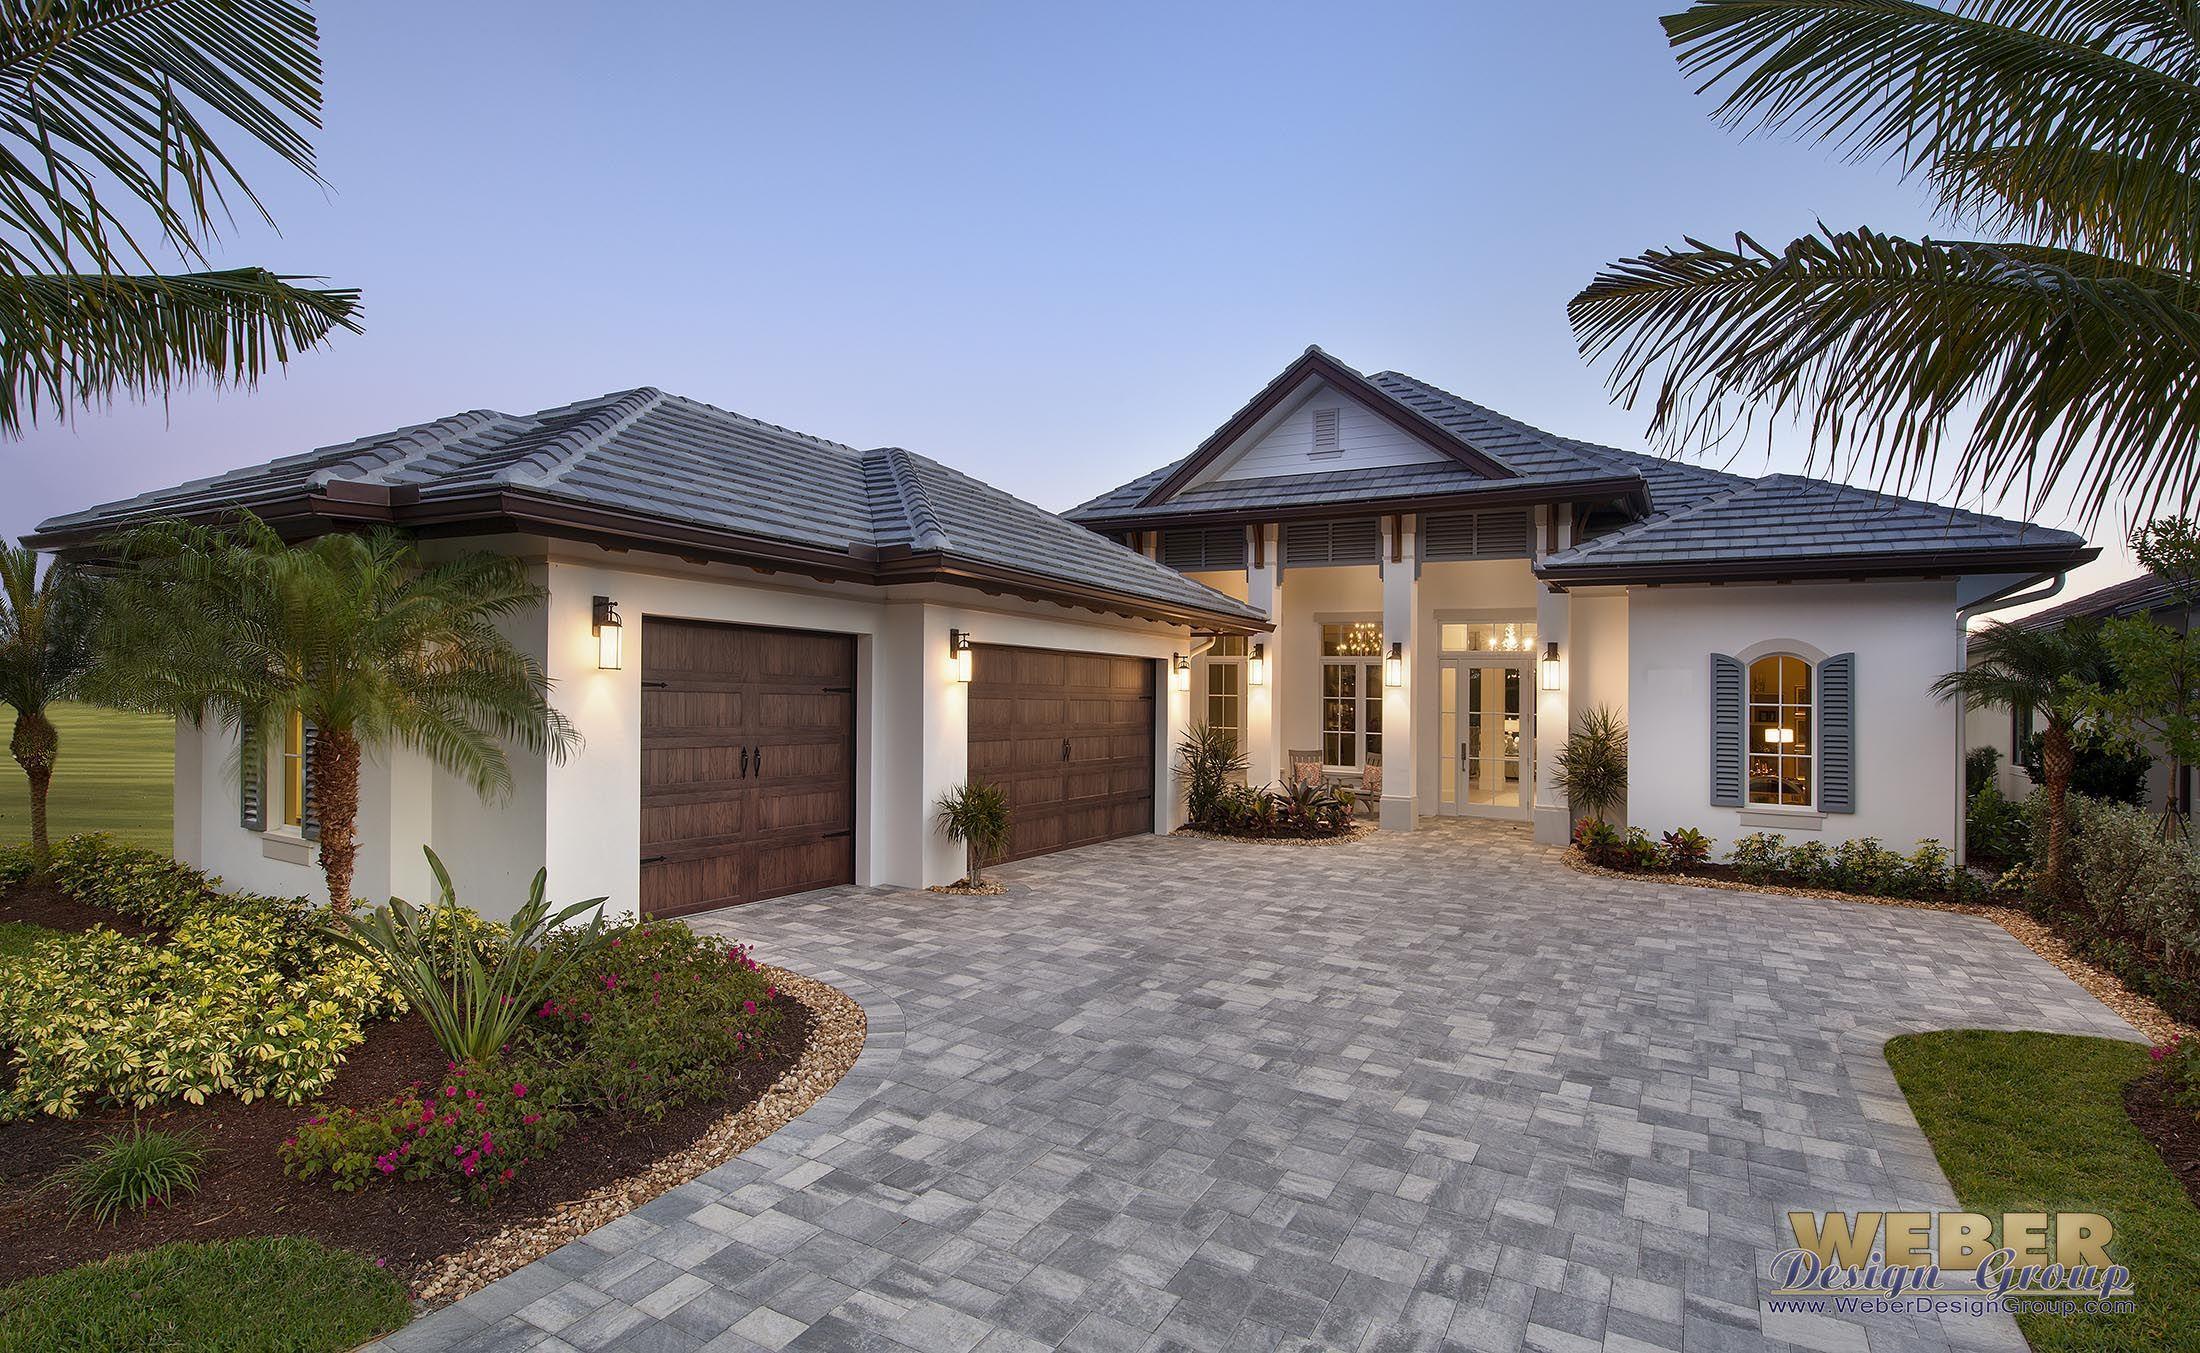 Caribbean Homes Designs Home Design House Plans Weber ...